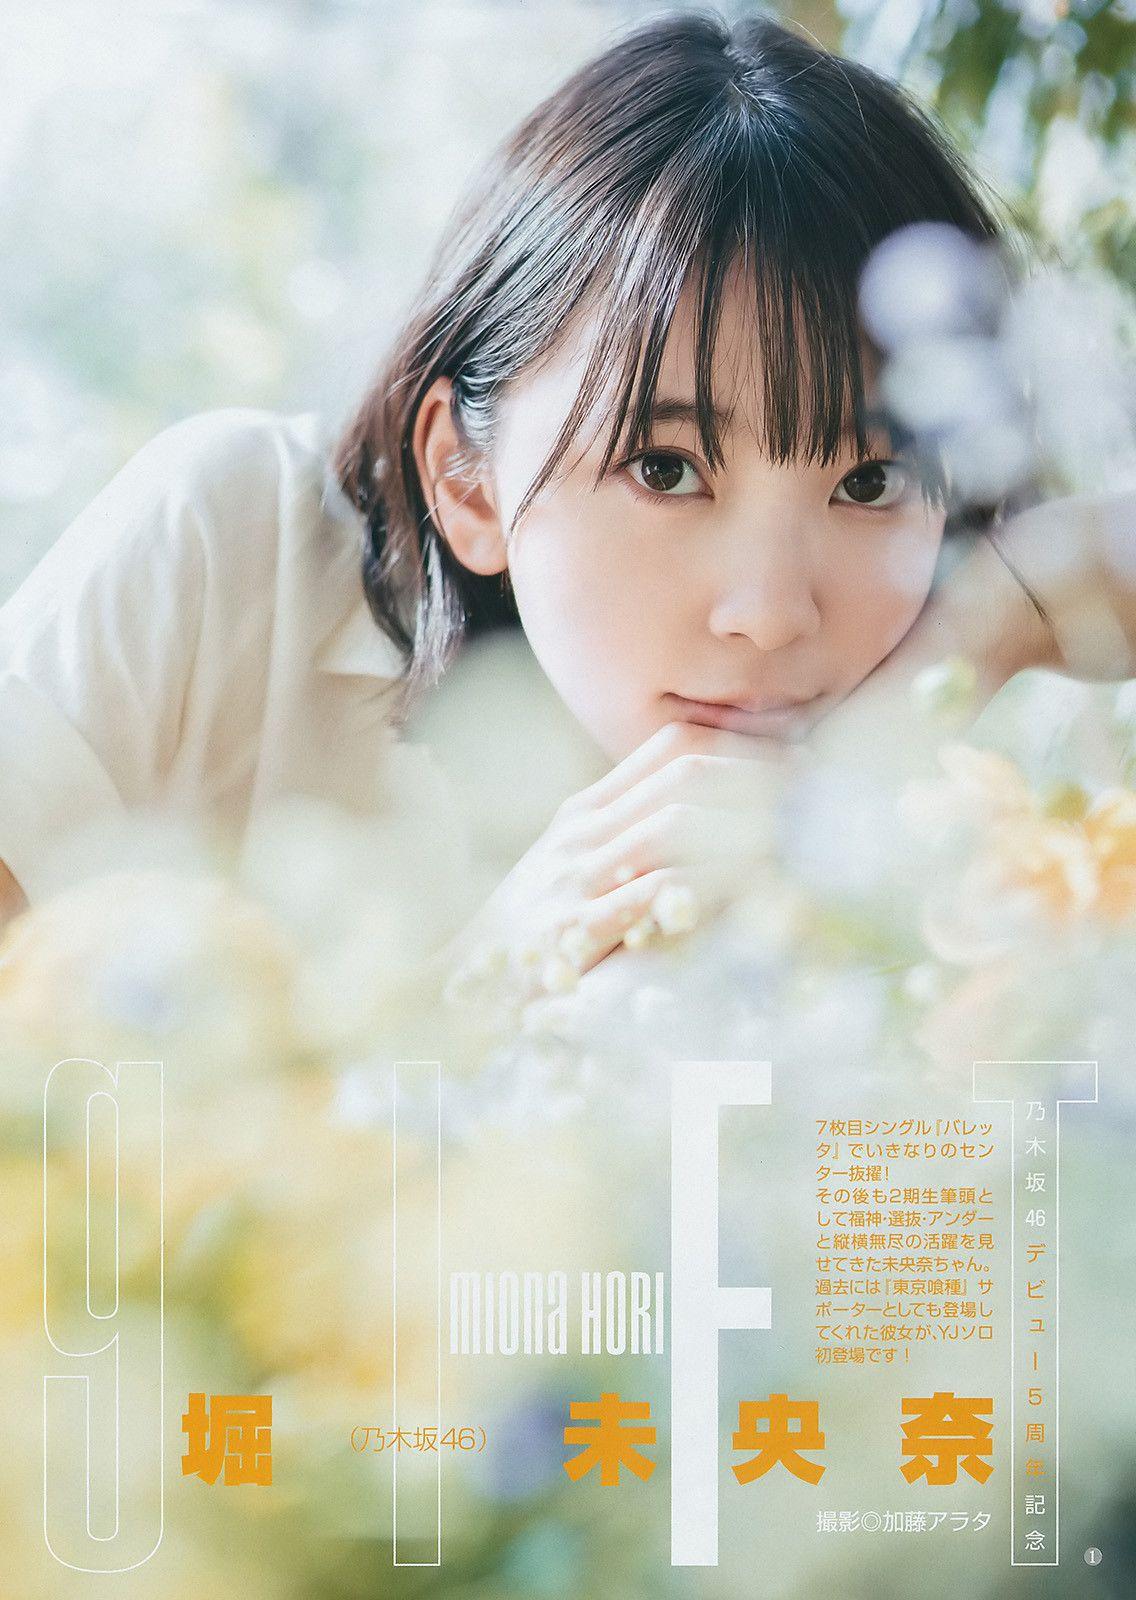 Nishino Nanase 2nd Photobook - 「Kaze O Kigaete」 | VOZ48